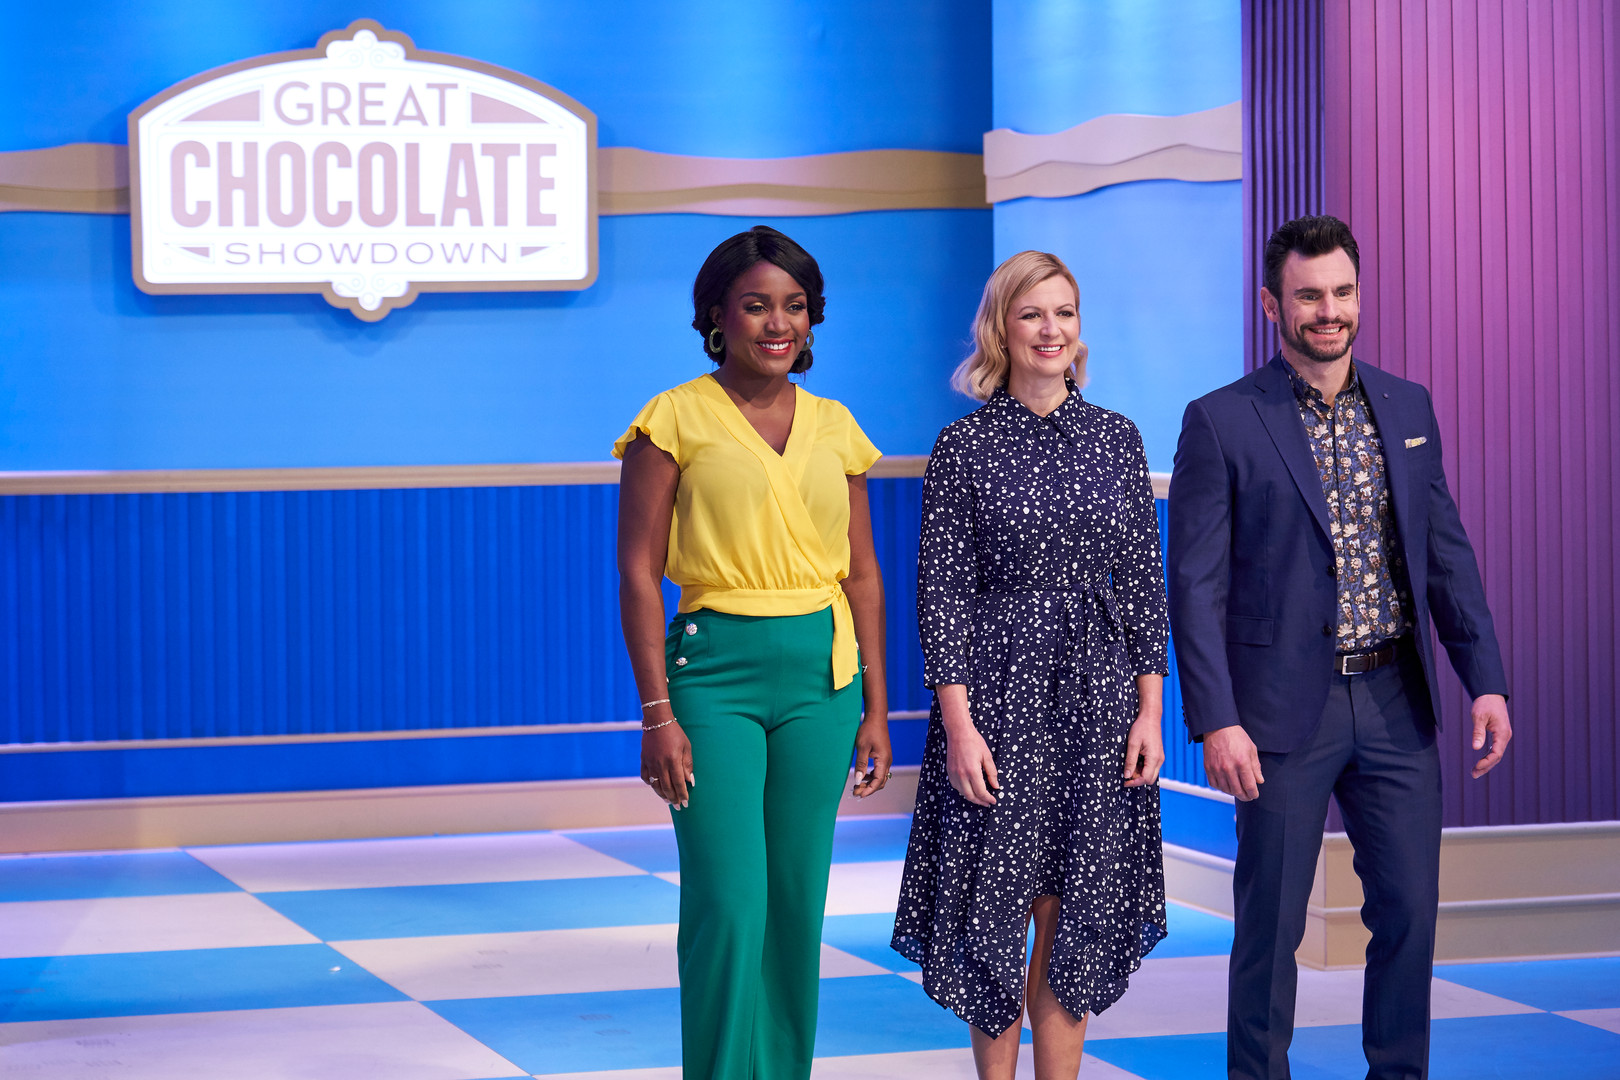 Great Chocolate Showdown Episodde 6